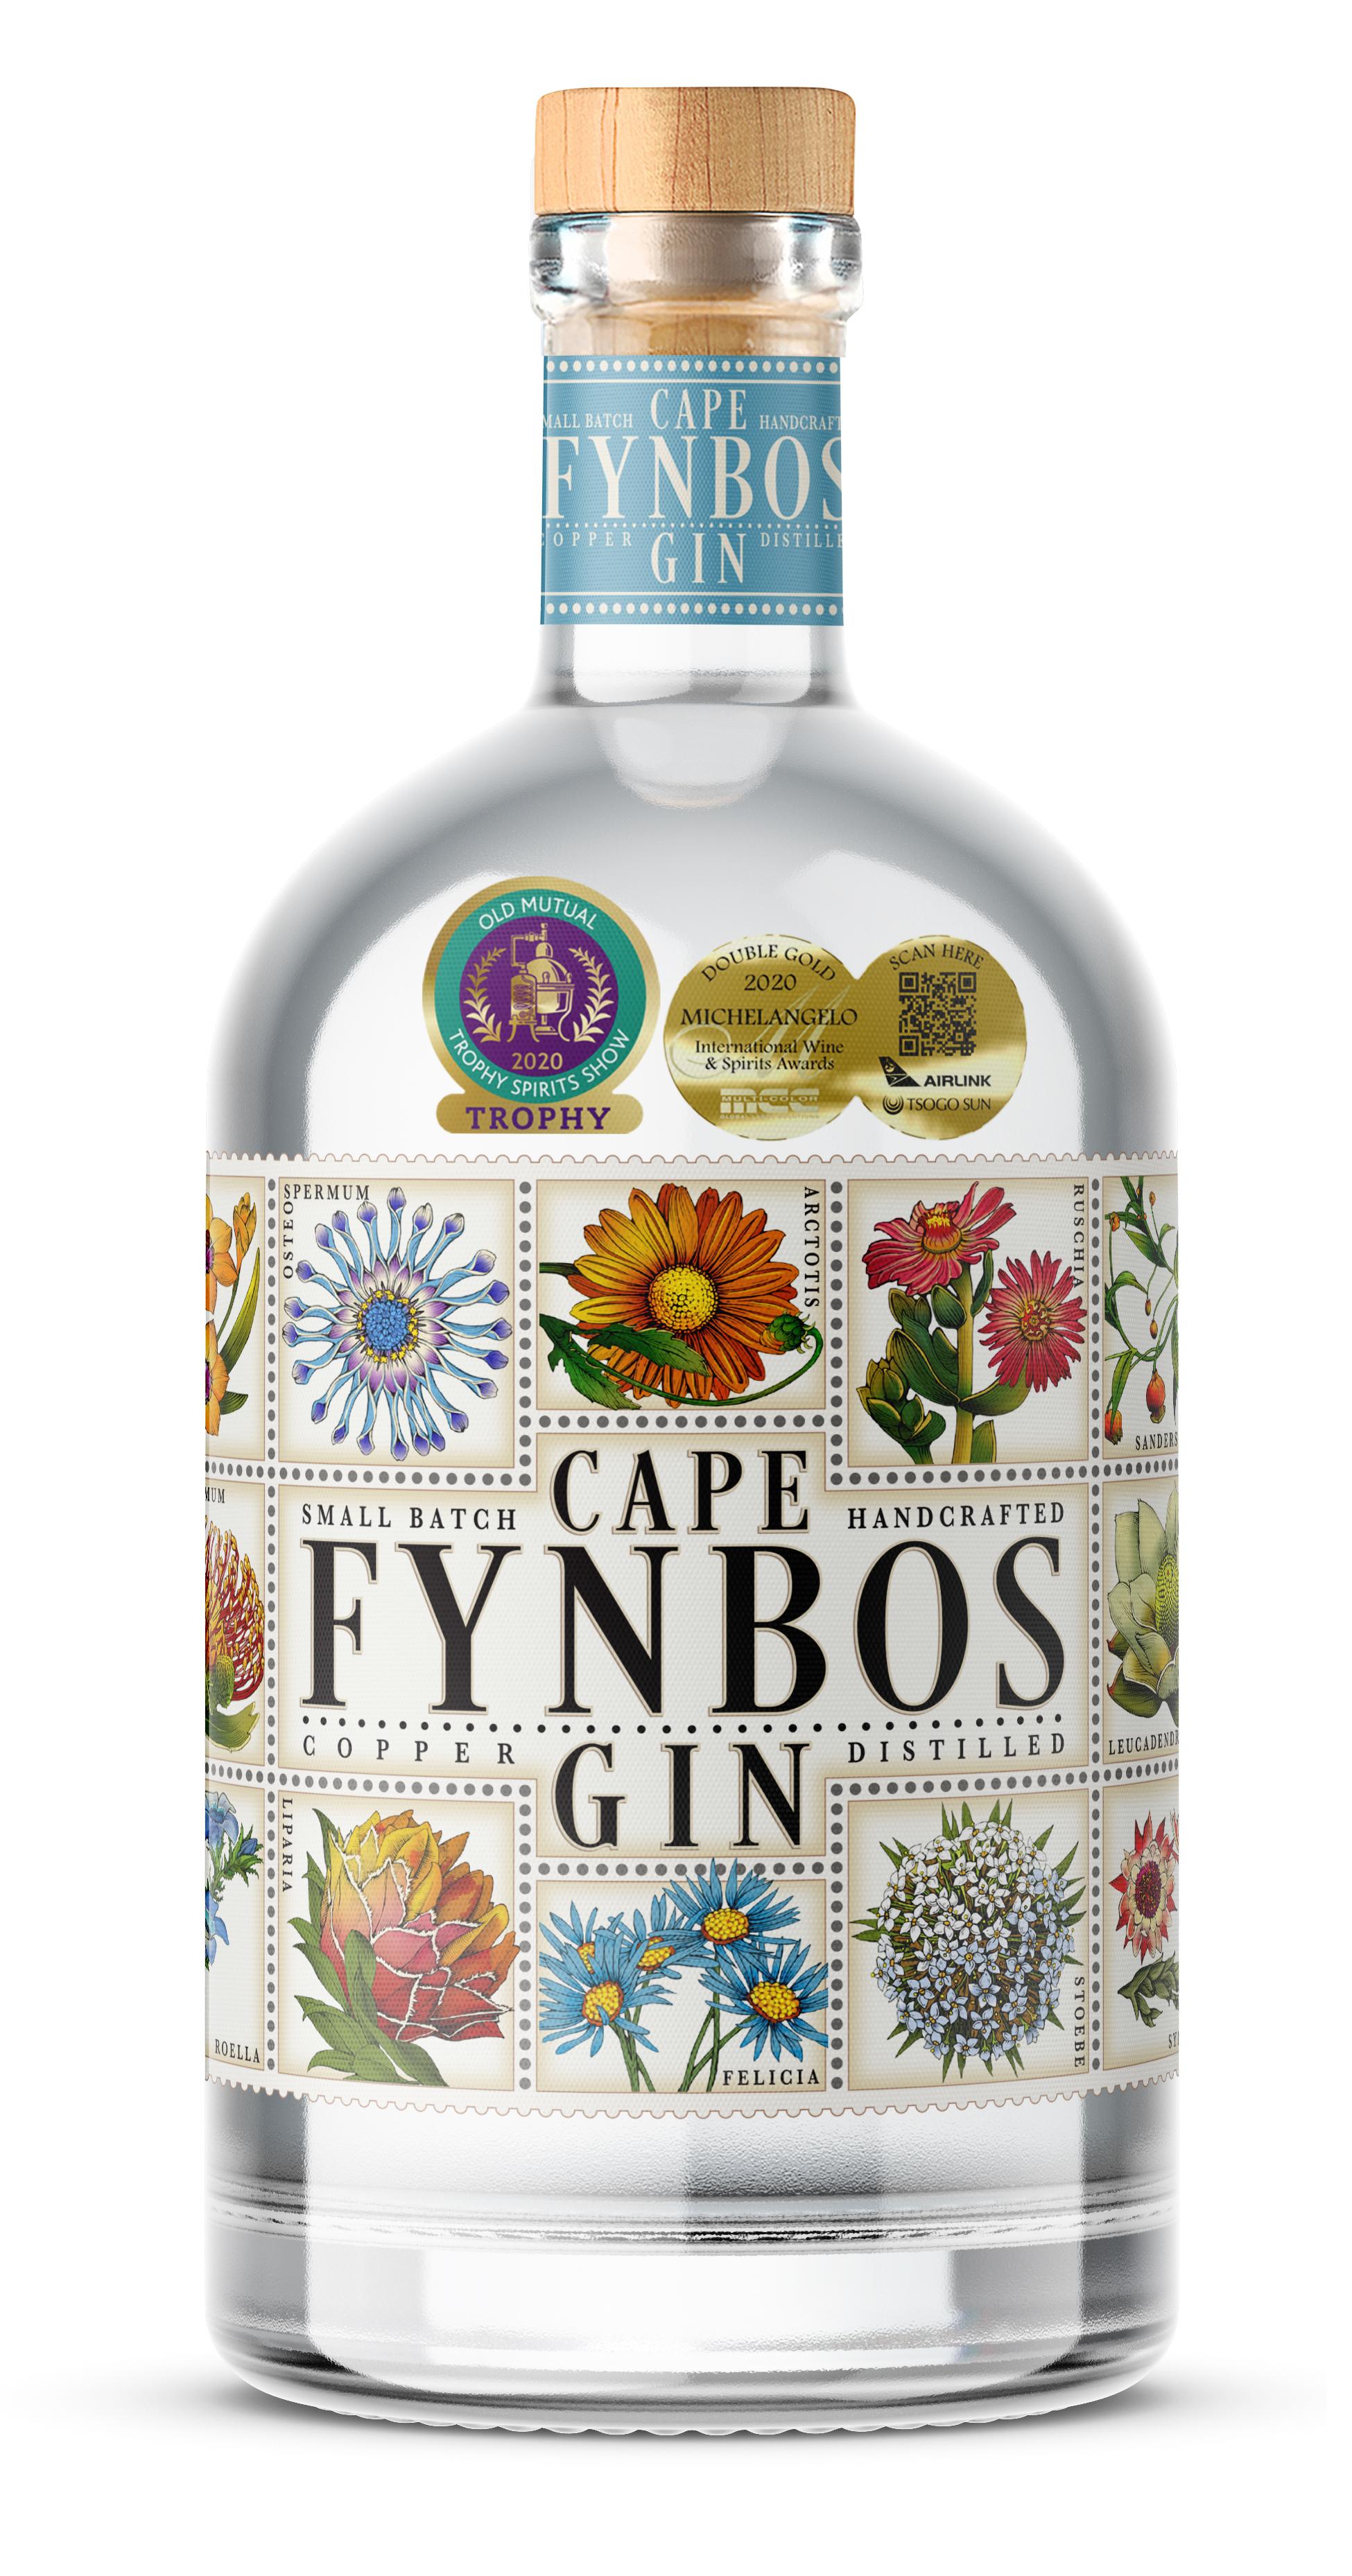 Cape Fynbos Classic Gin